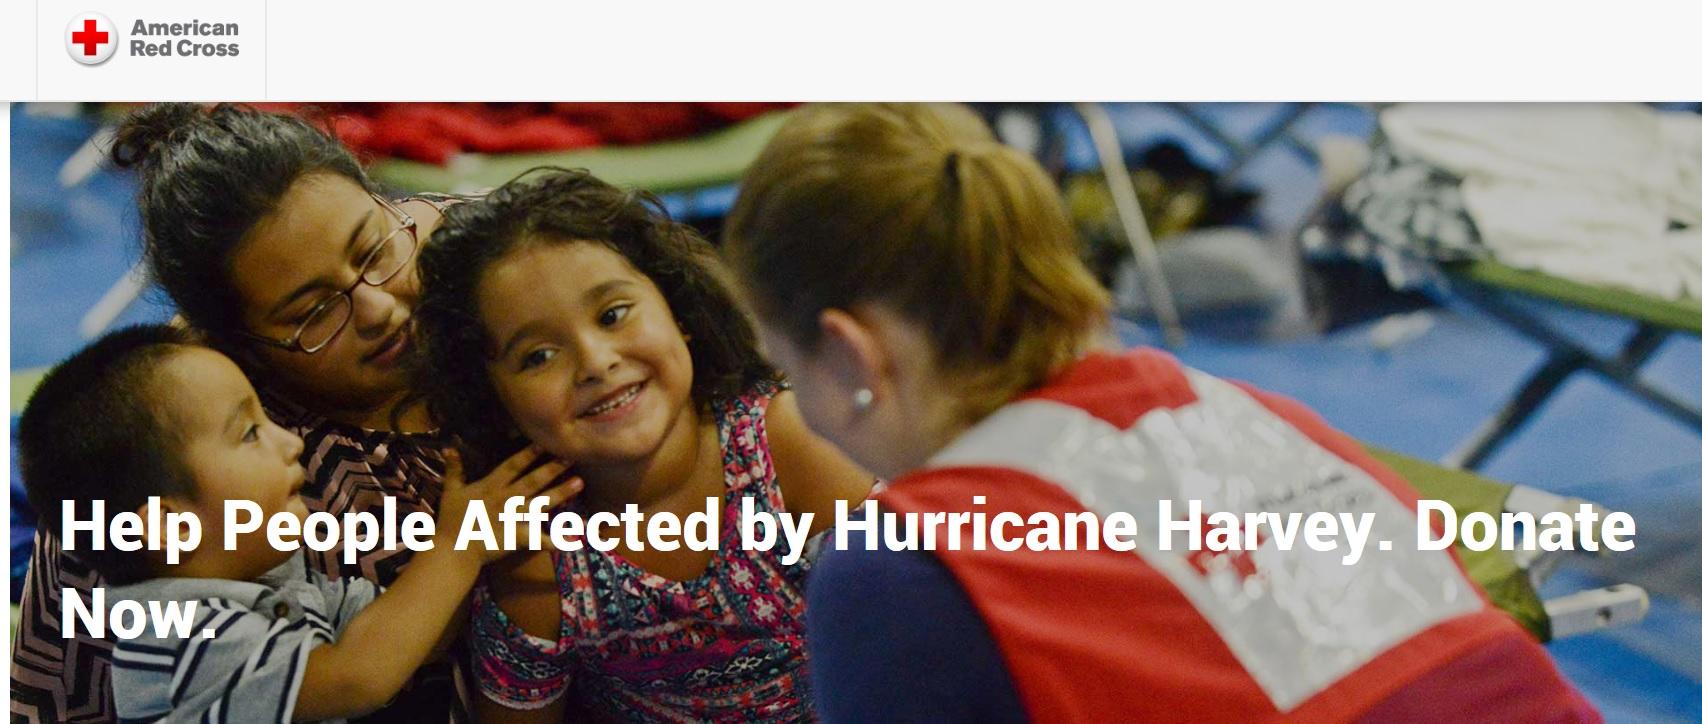 Harvey Red Cross